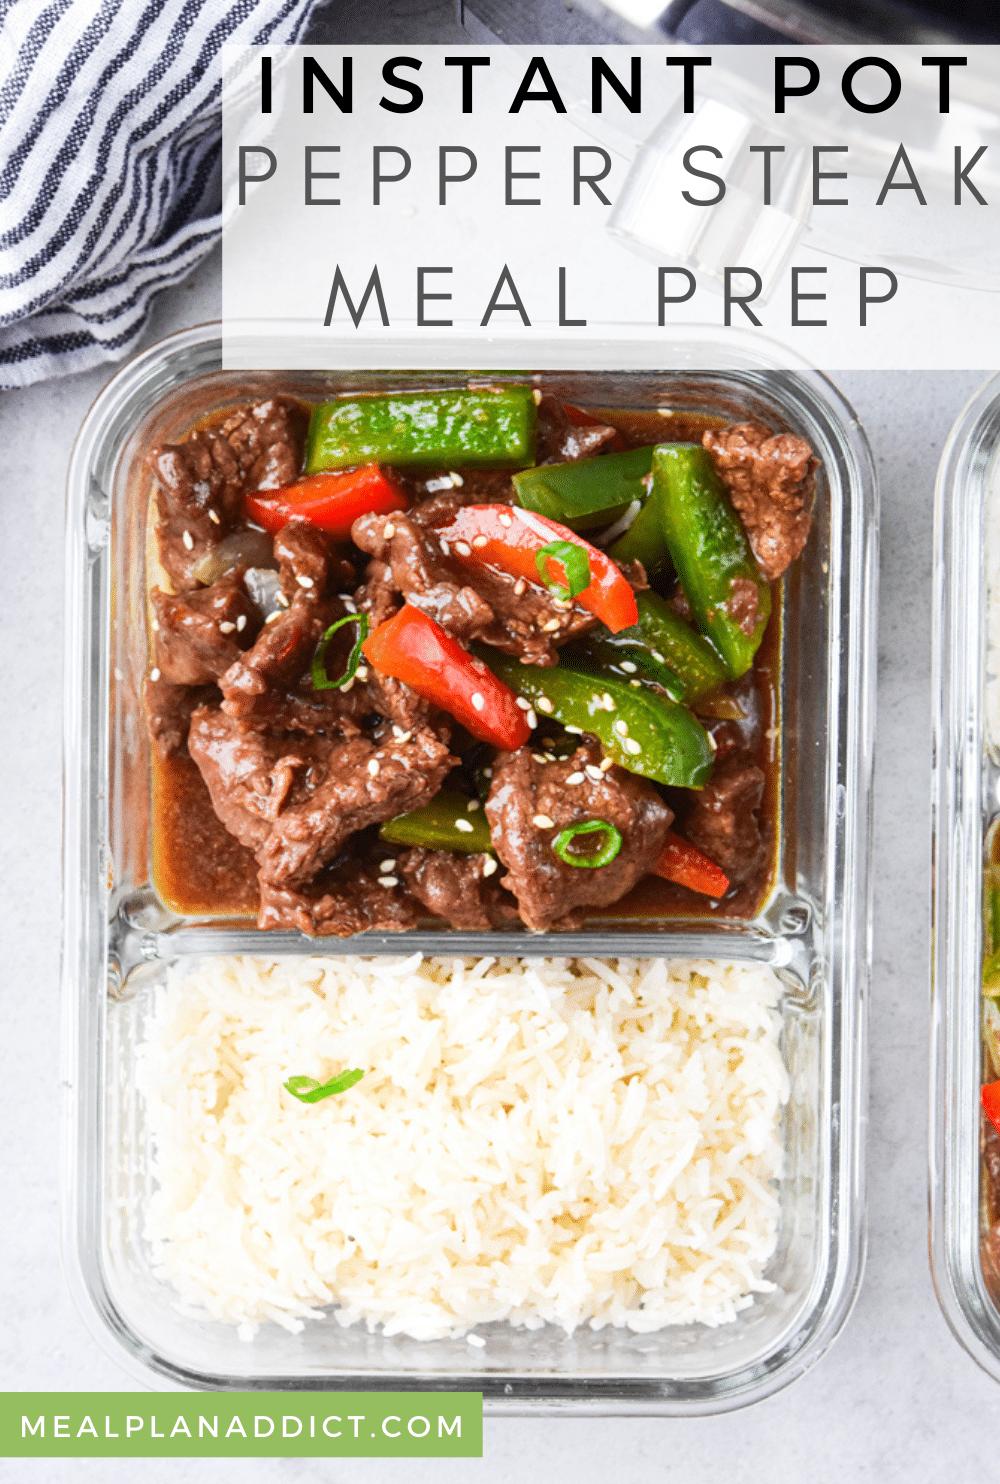 Meal Prep Instant Pot Pepper Steak Stir Fry Recipe | Meal Plan Addict